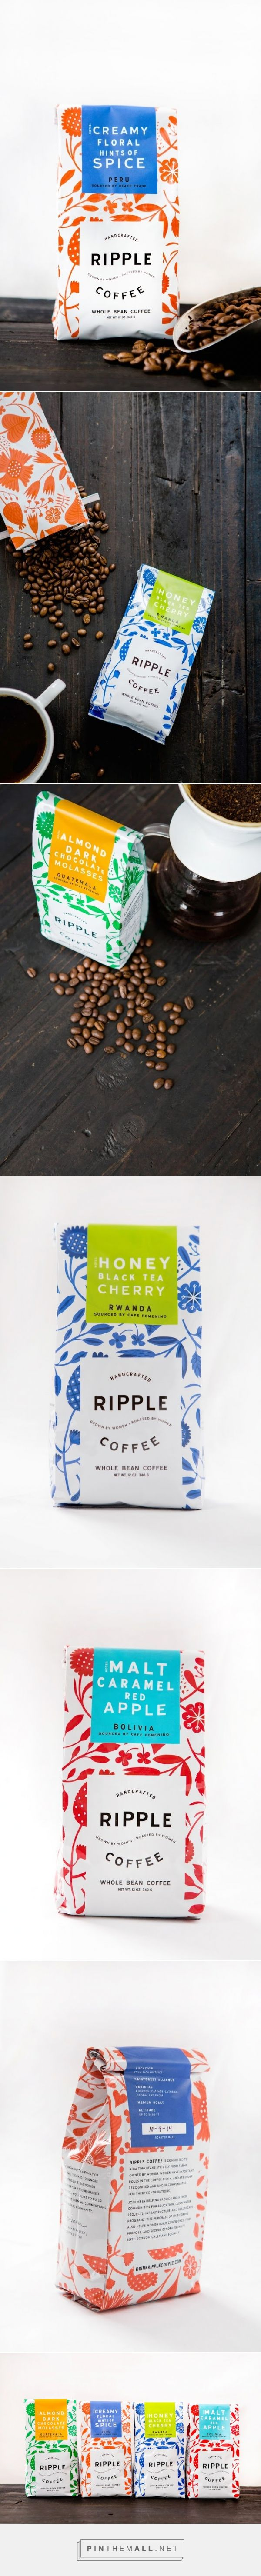 Ripple Coffee